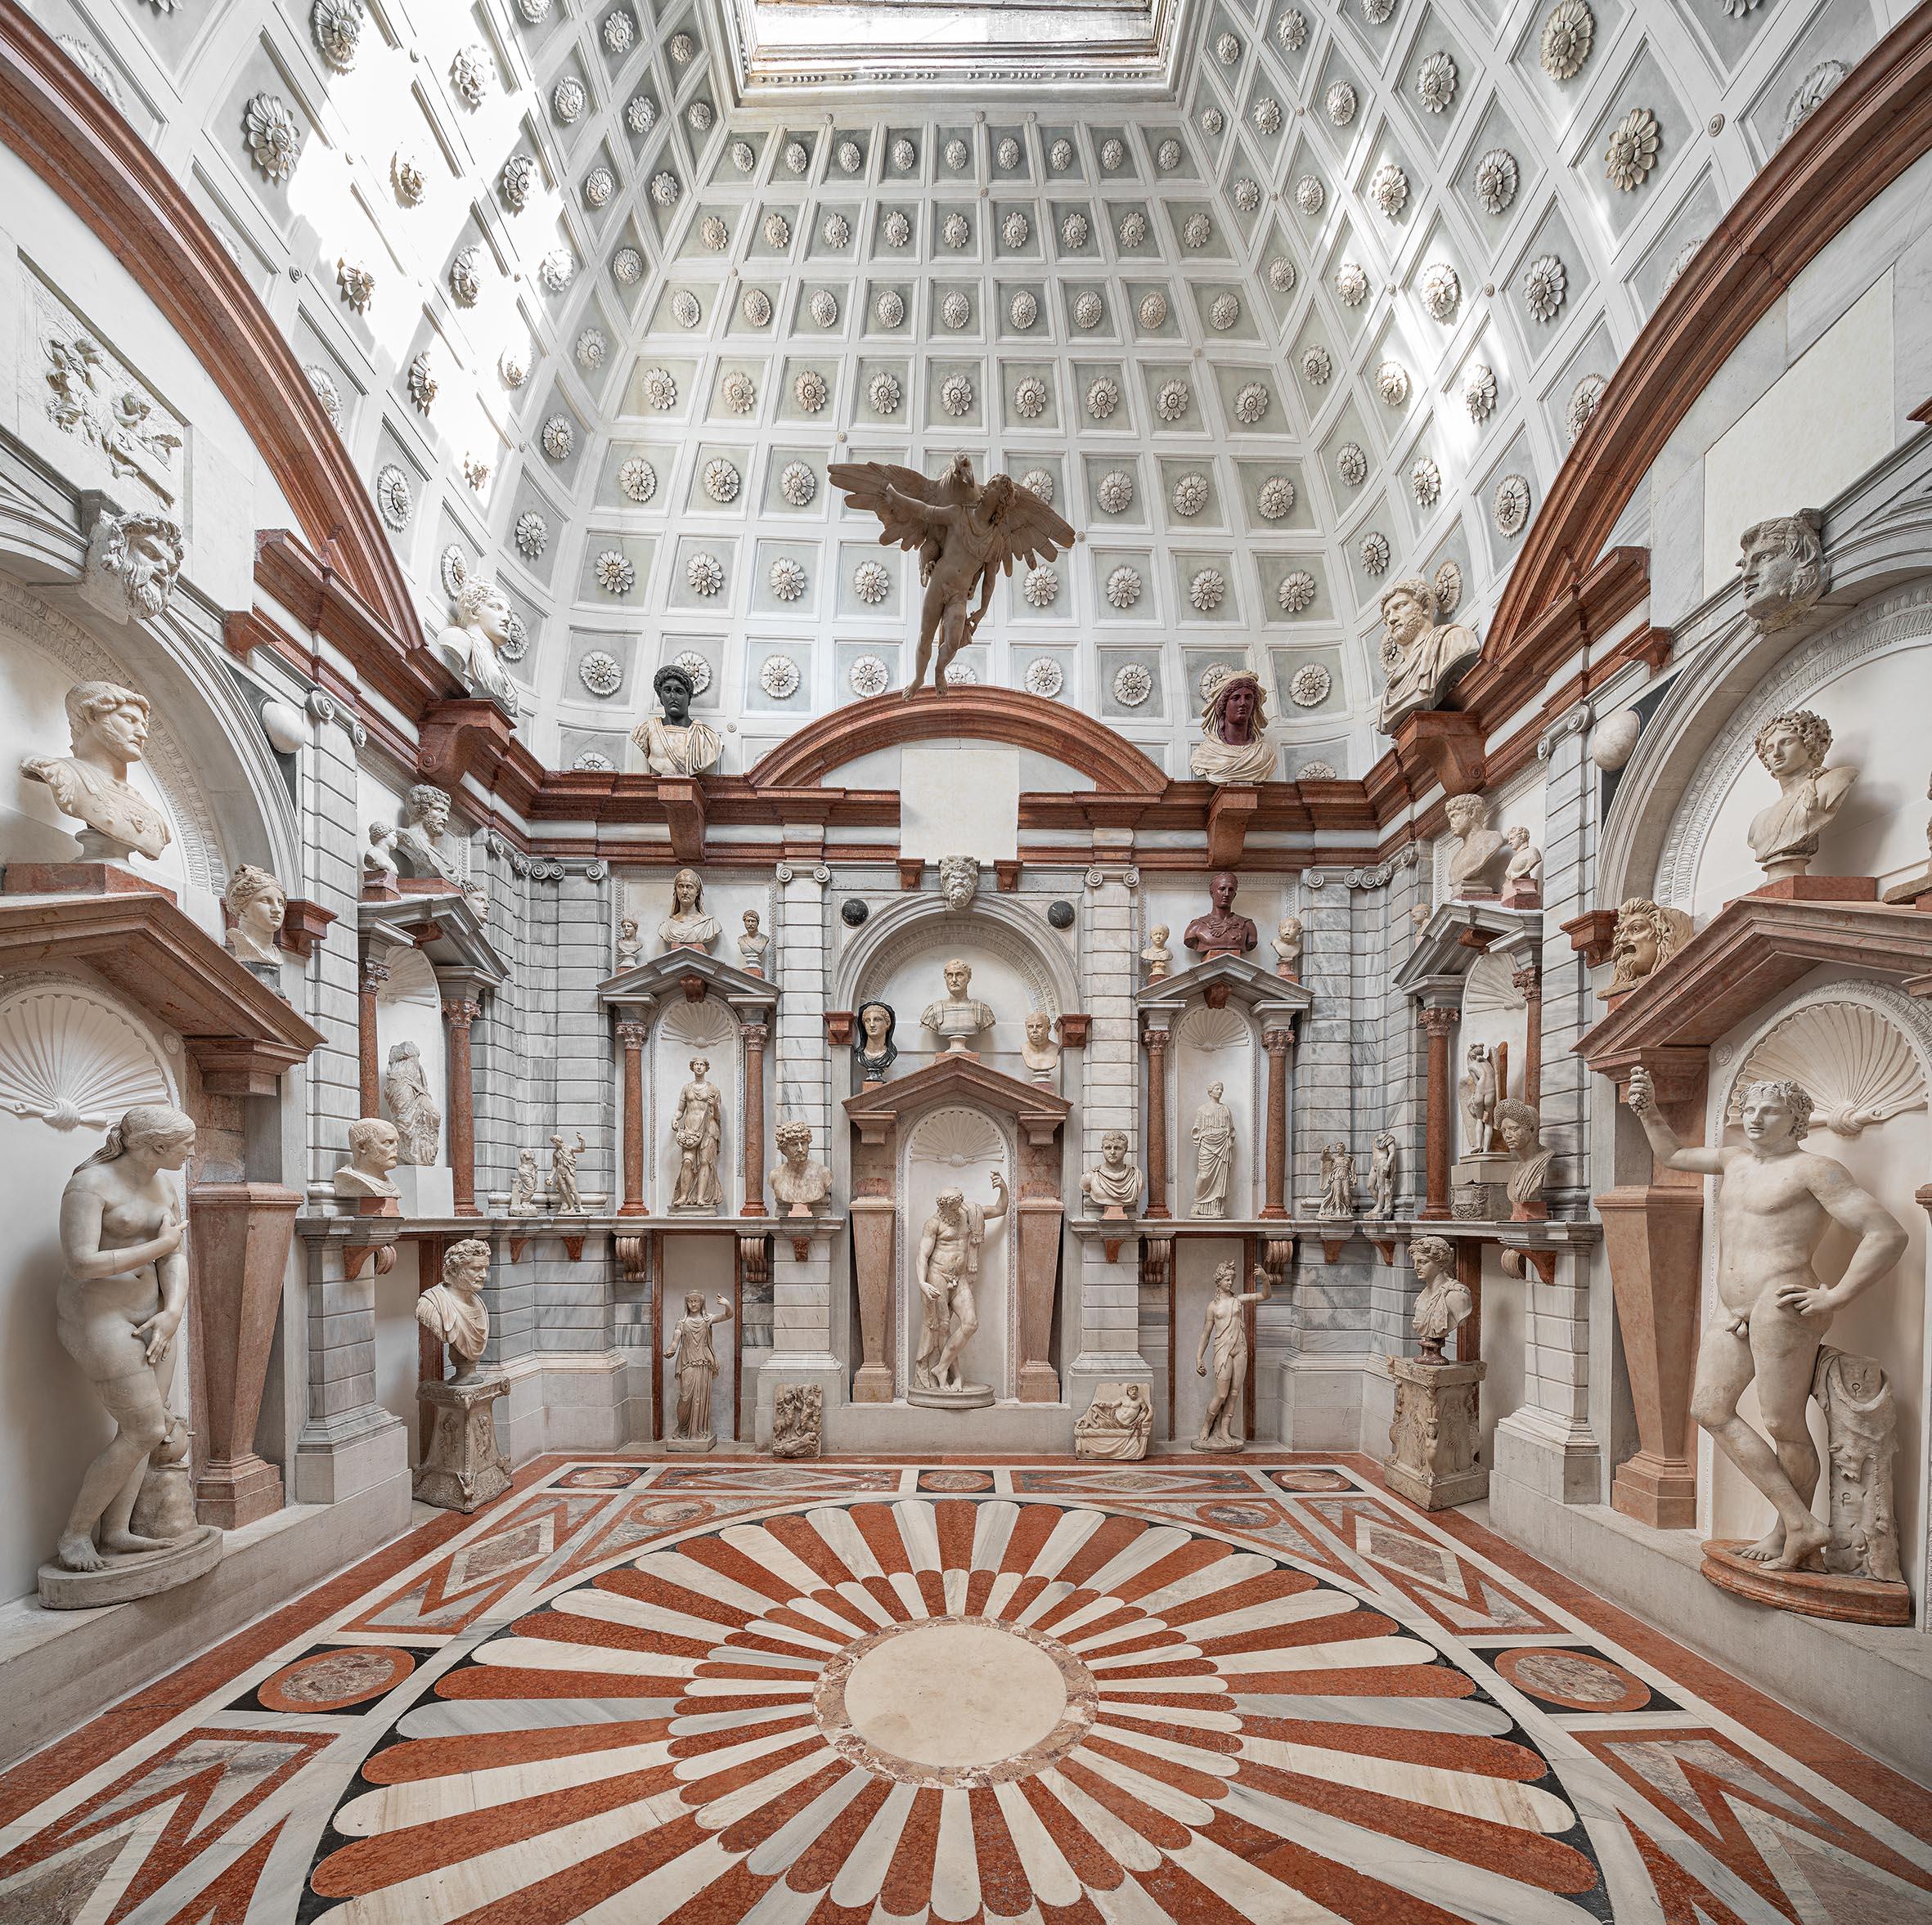 Palatial Art and Architecture in Venice - Palazzo Grimani